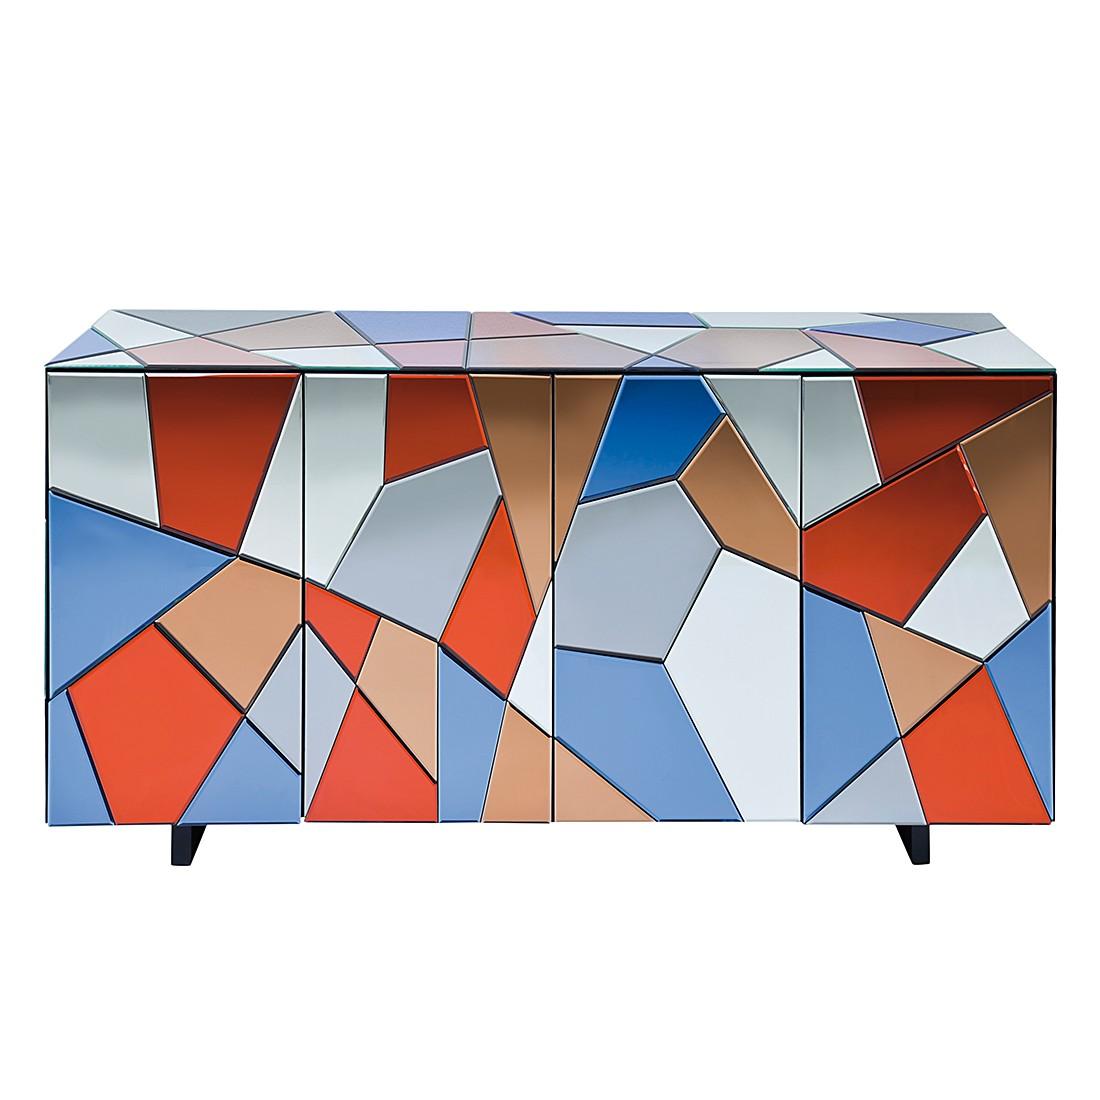 Sideboard Colored Fields - Glas Bunt, Kare Design